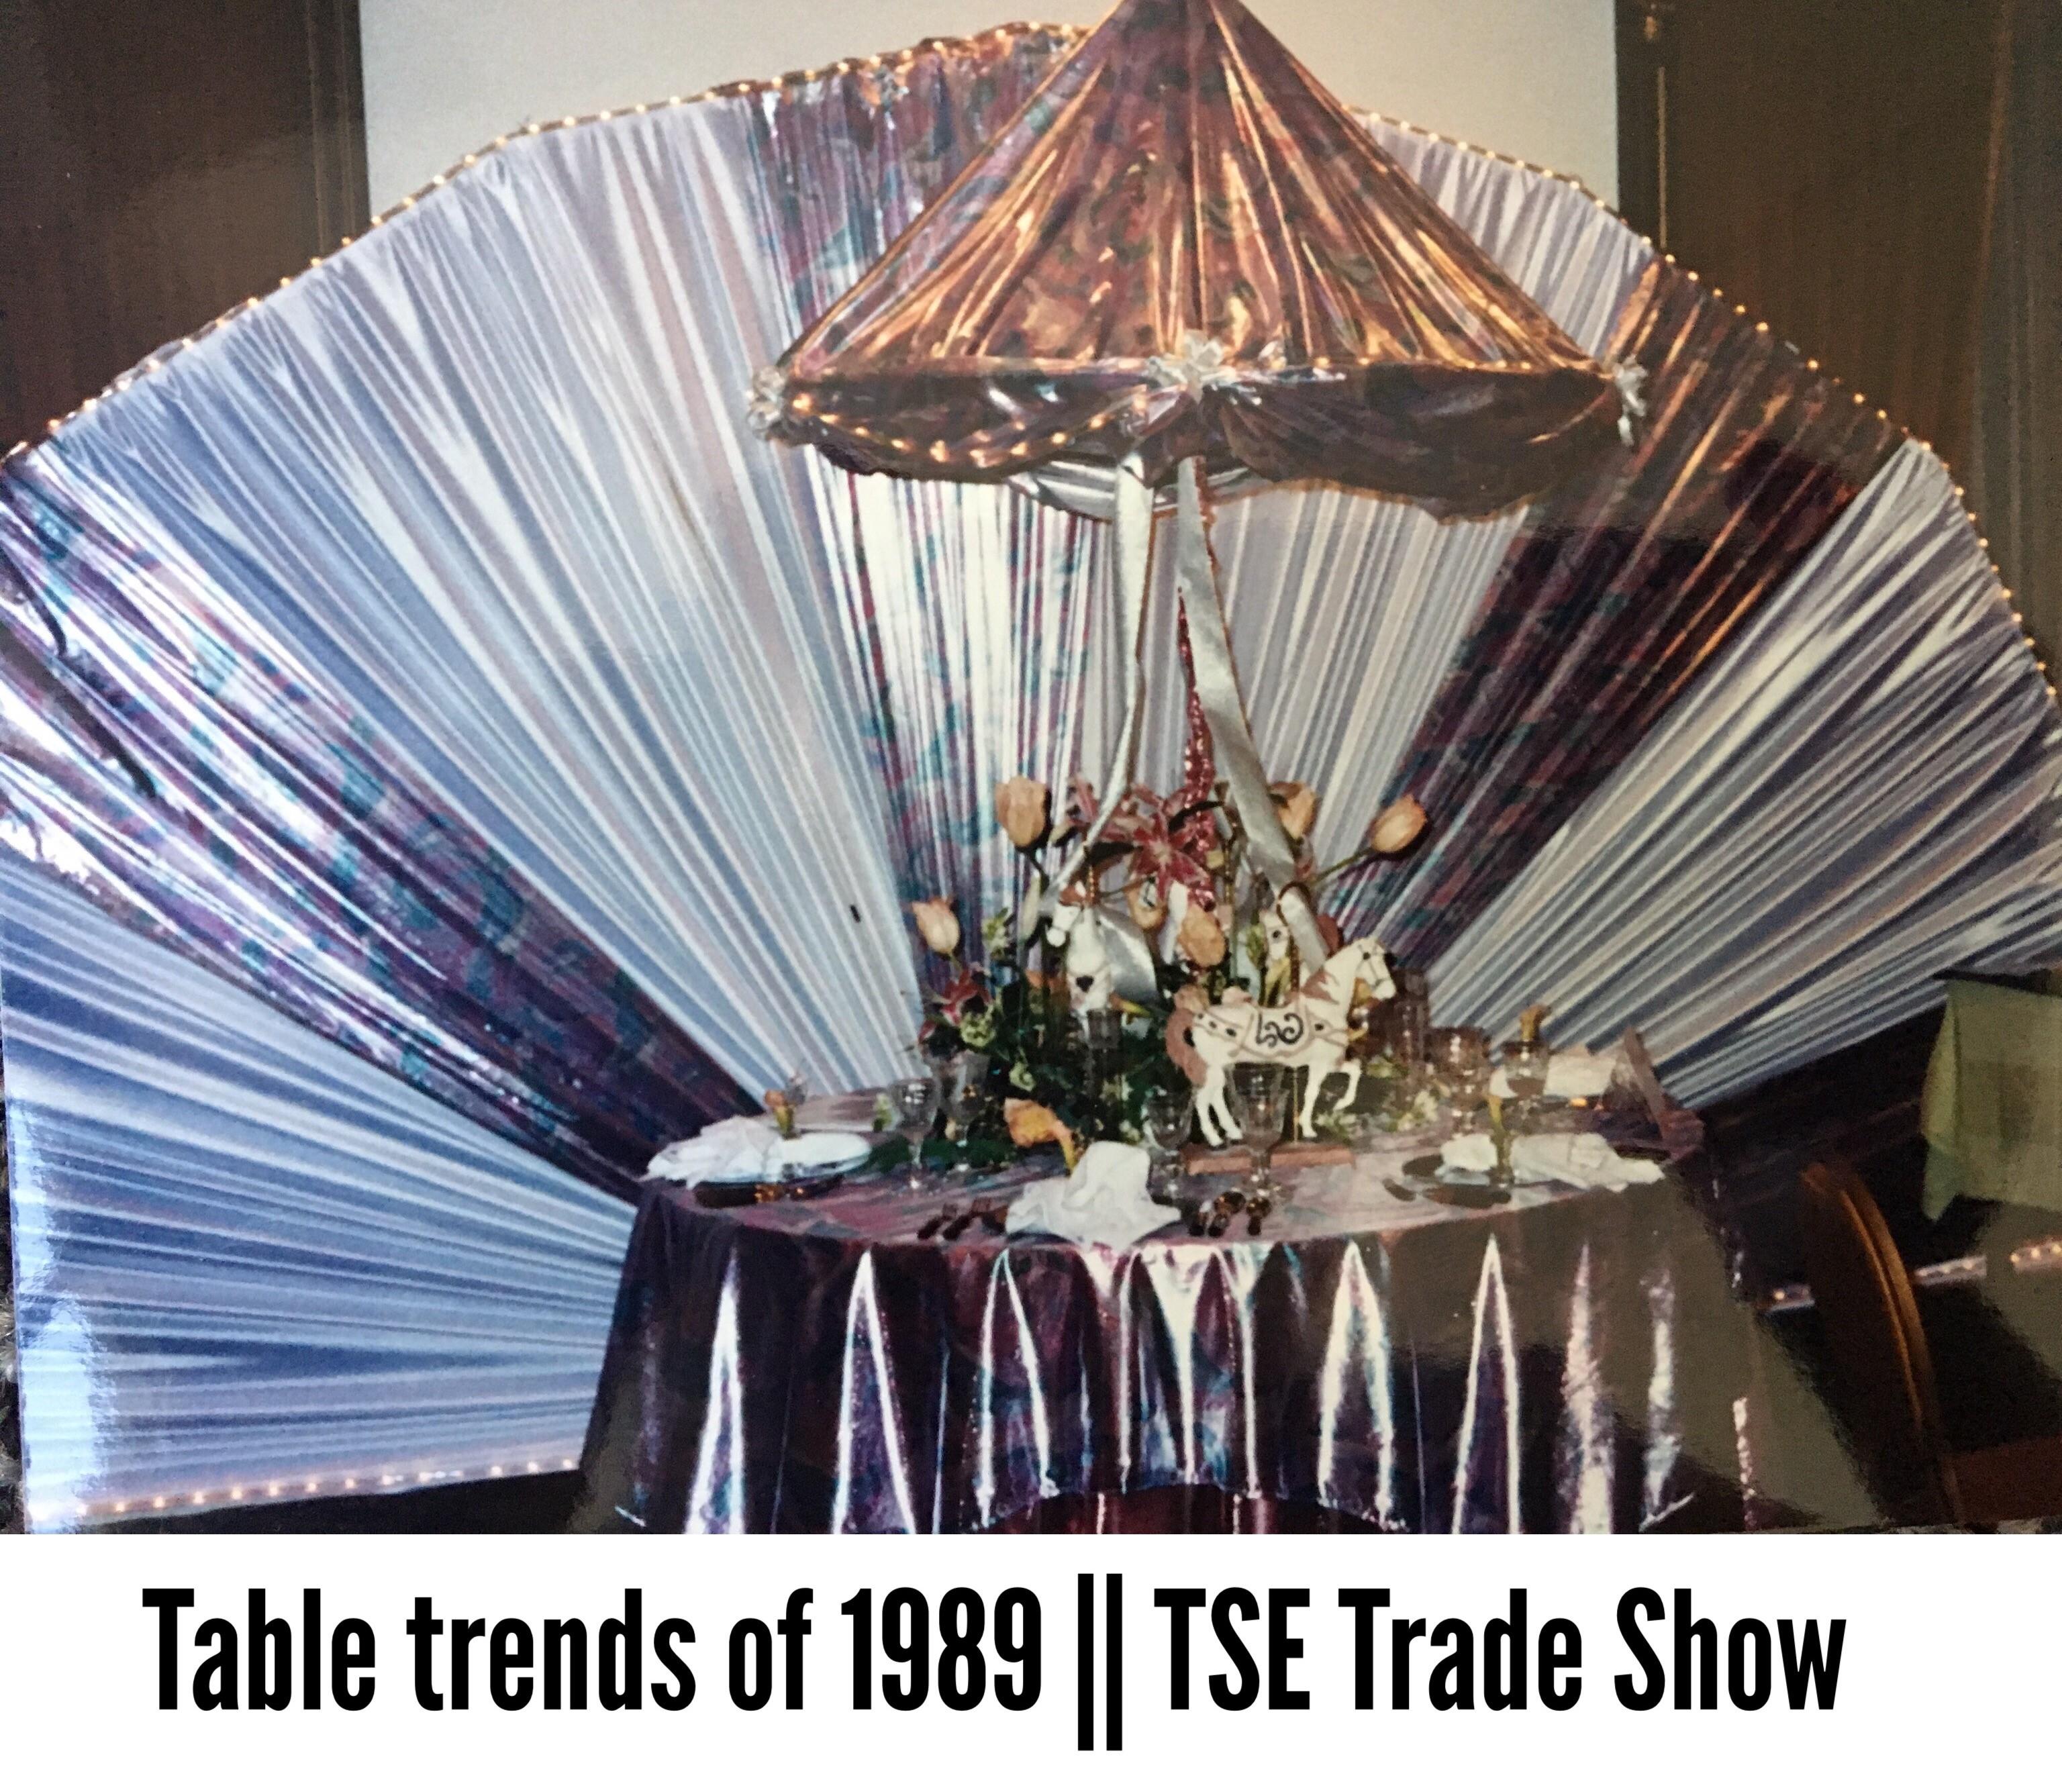 TSE 1989 Tabletop Trends